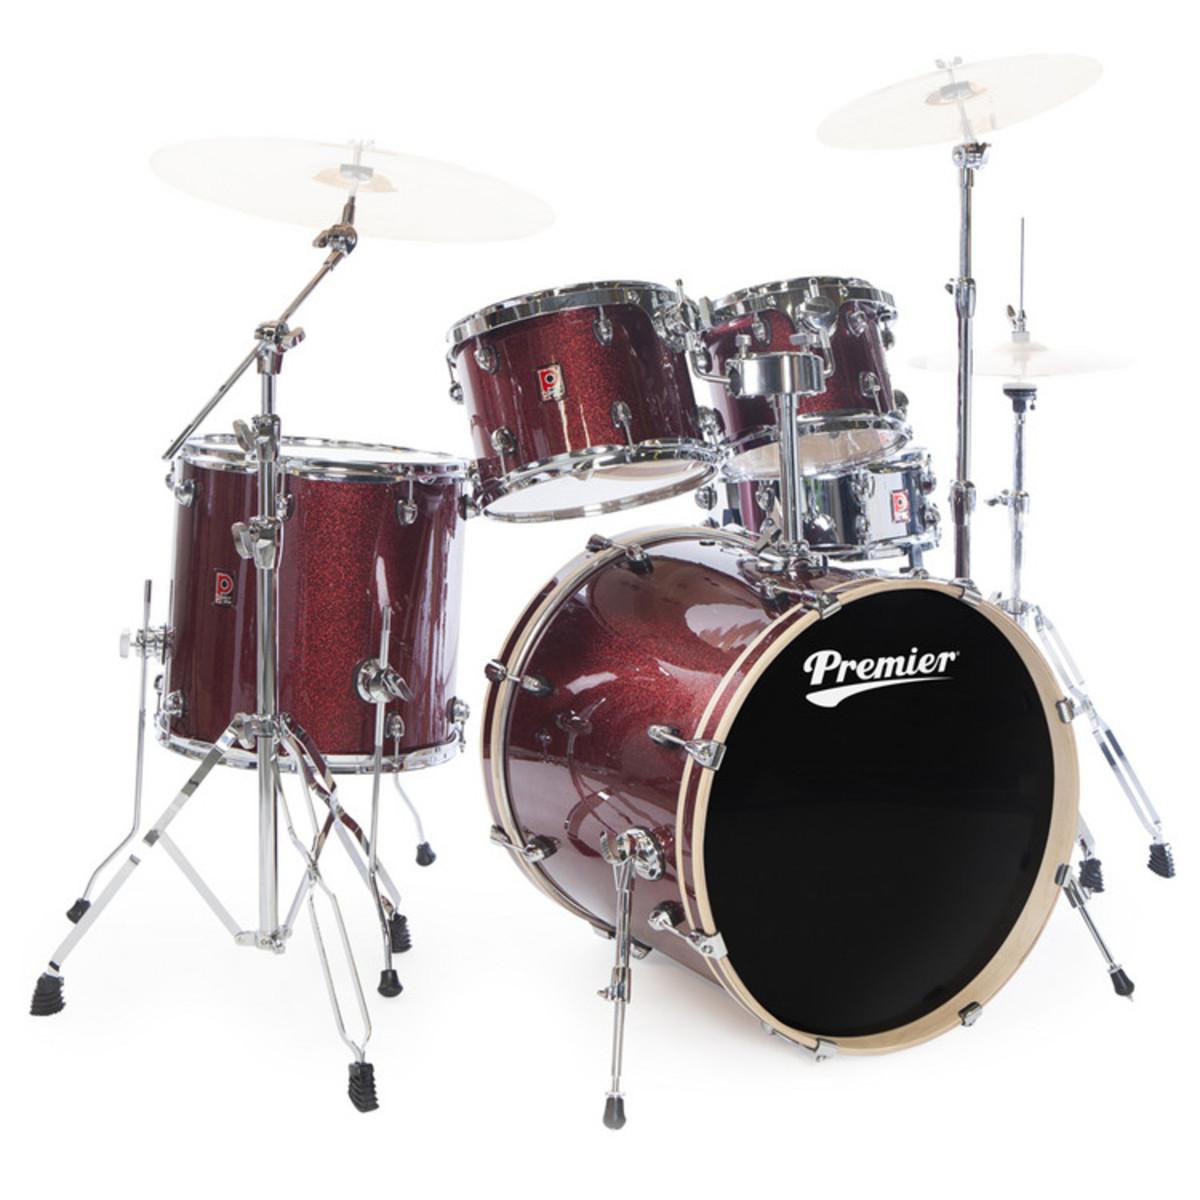 DISC Premier APK Modern Rock 5 Piece Drum Kit, Red Solar Wrap